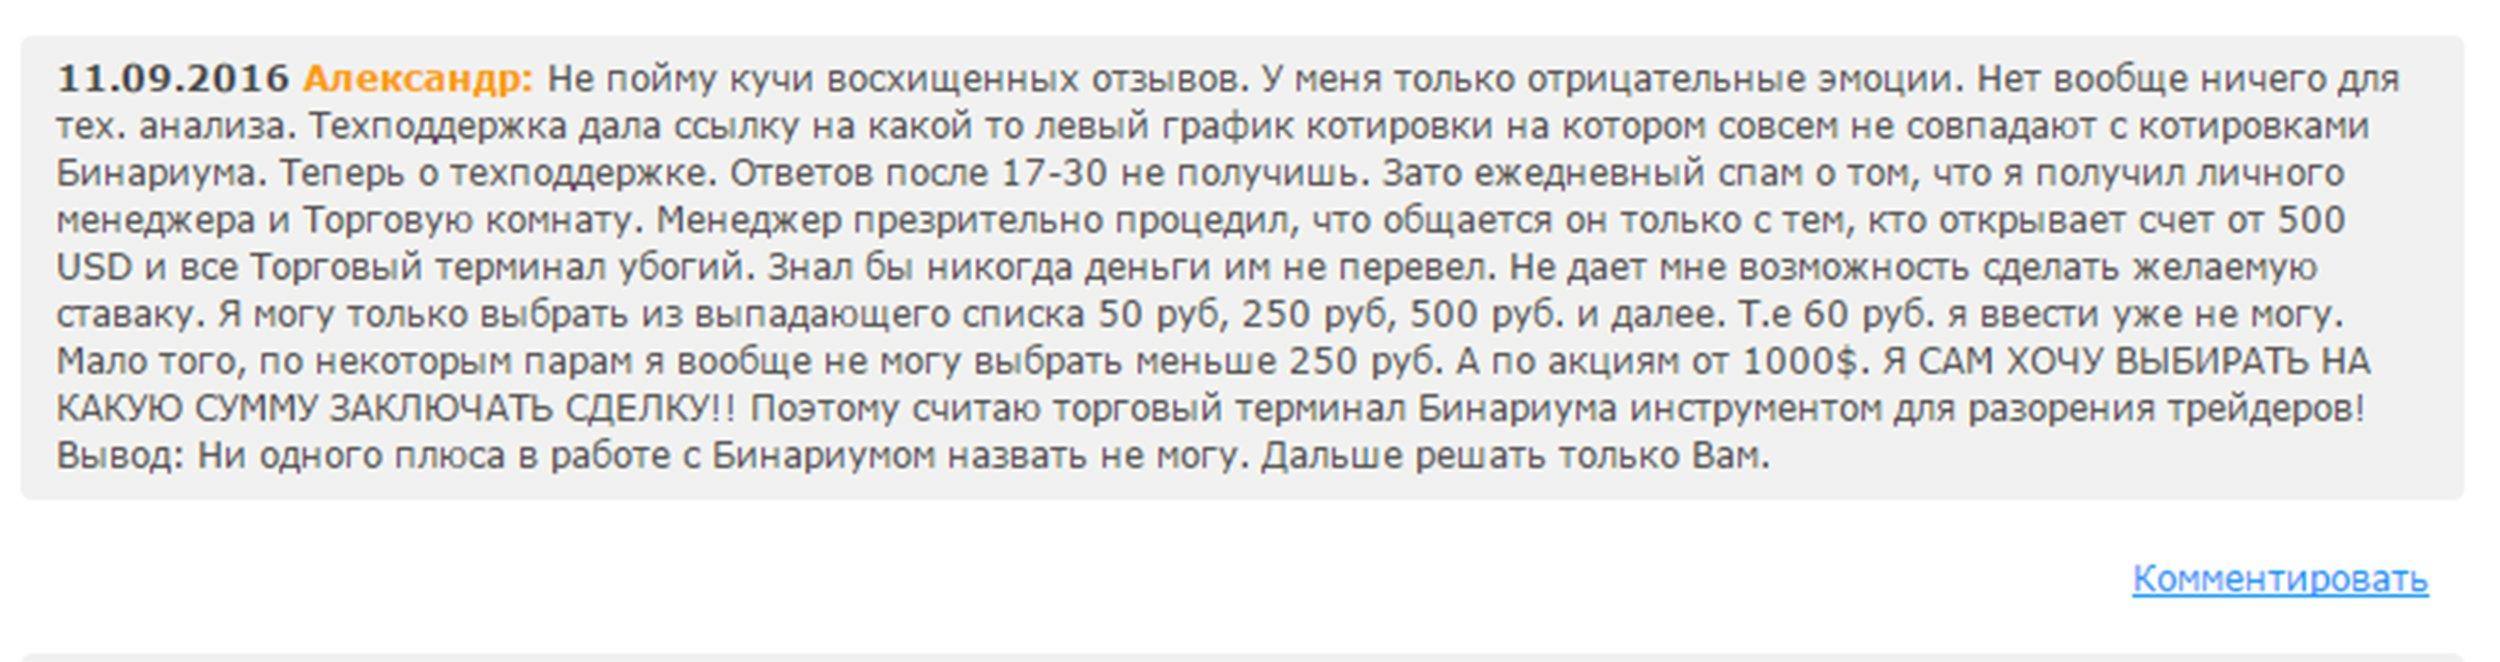 Отзывы с сайта ratingfx.ru о Бинариум